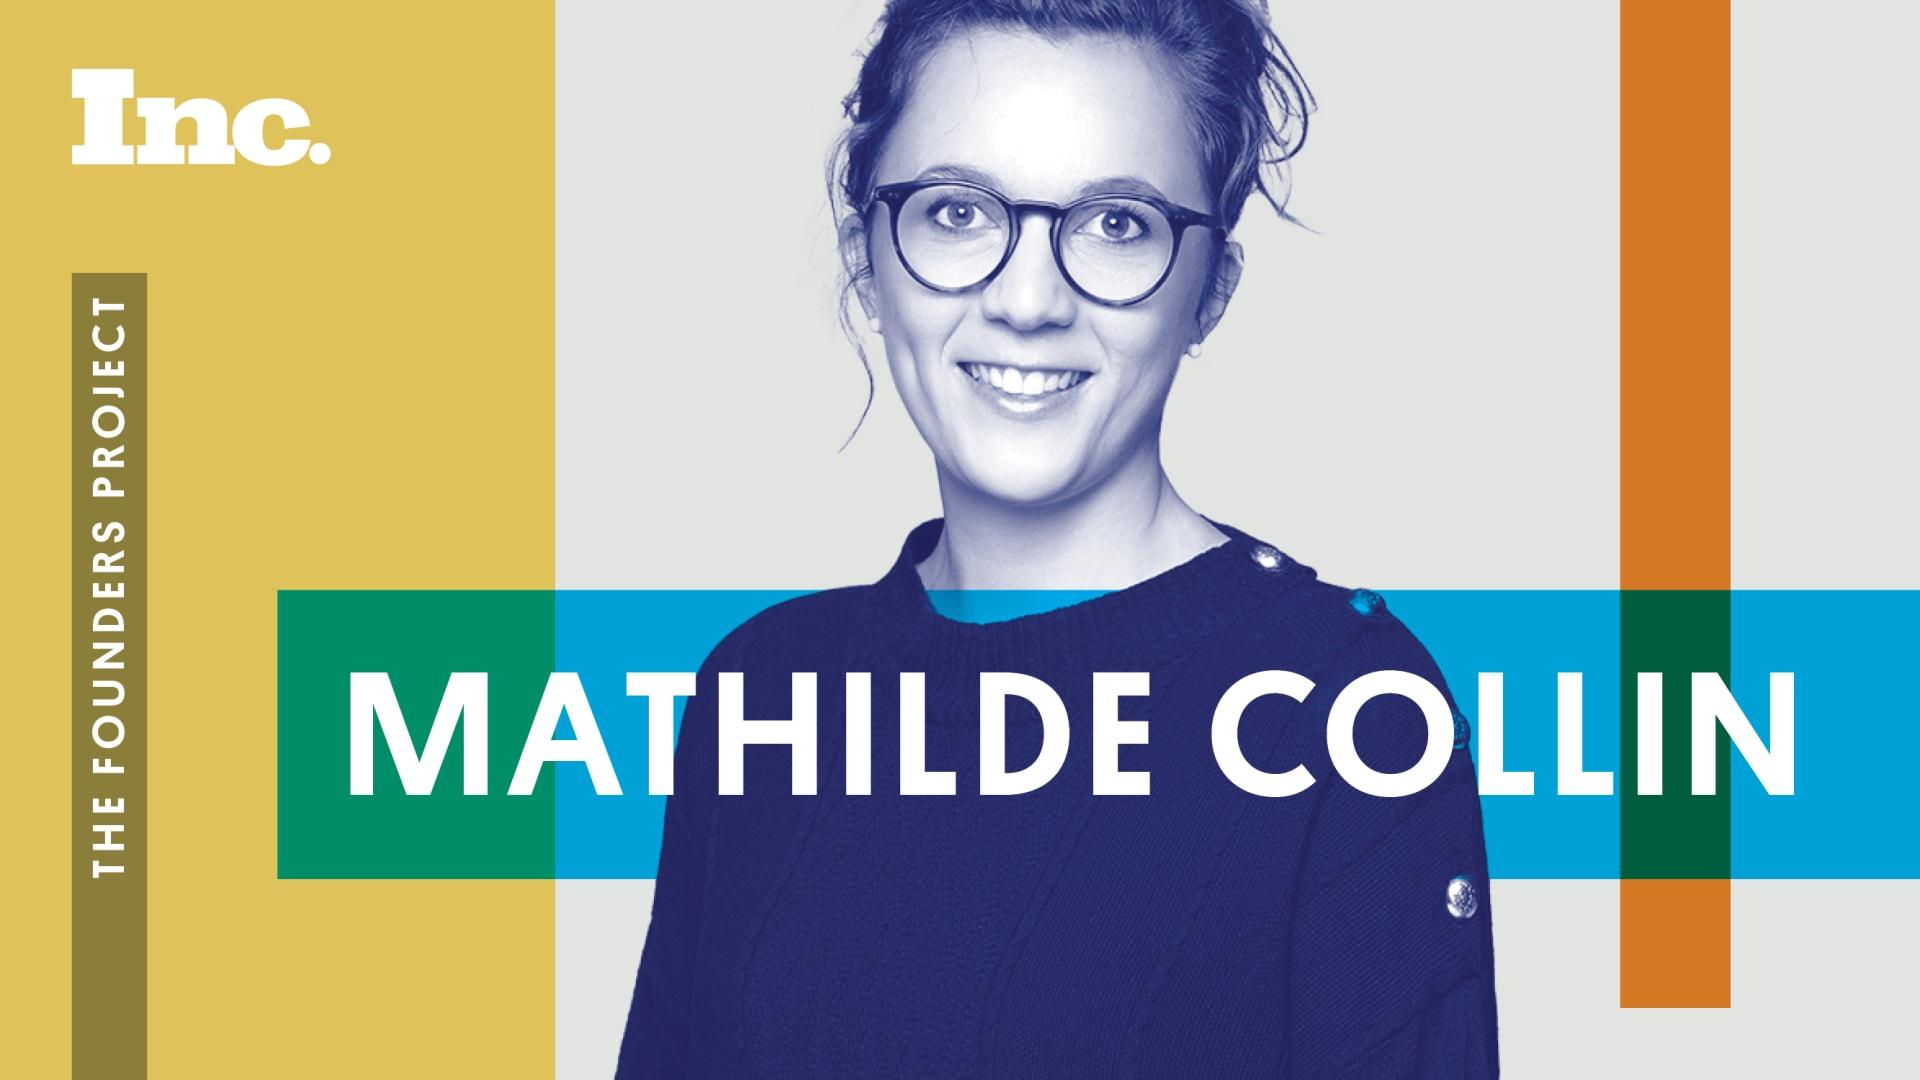 Mathilde Collin.